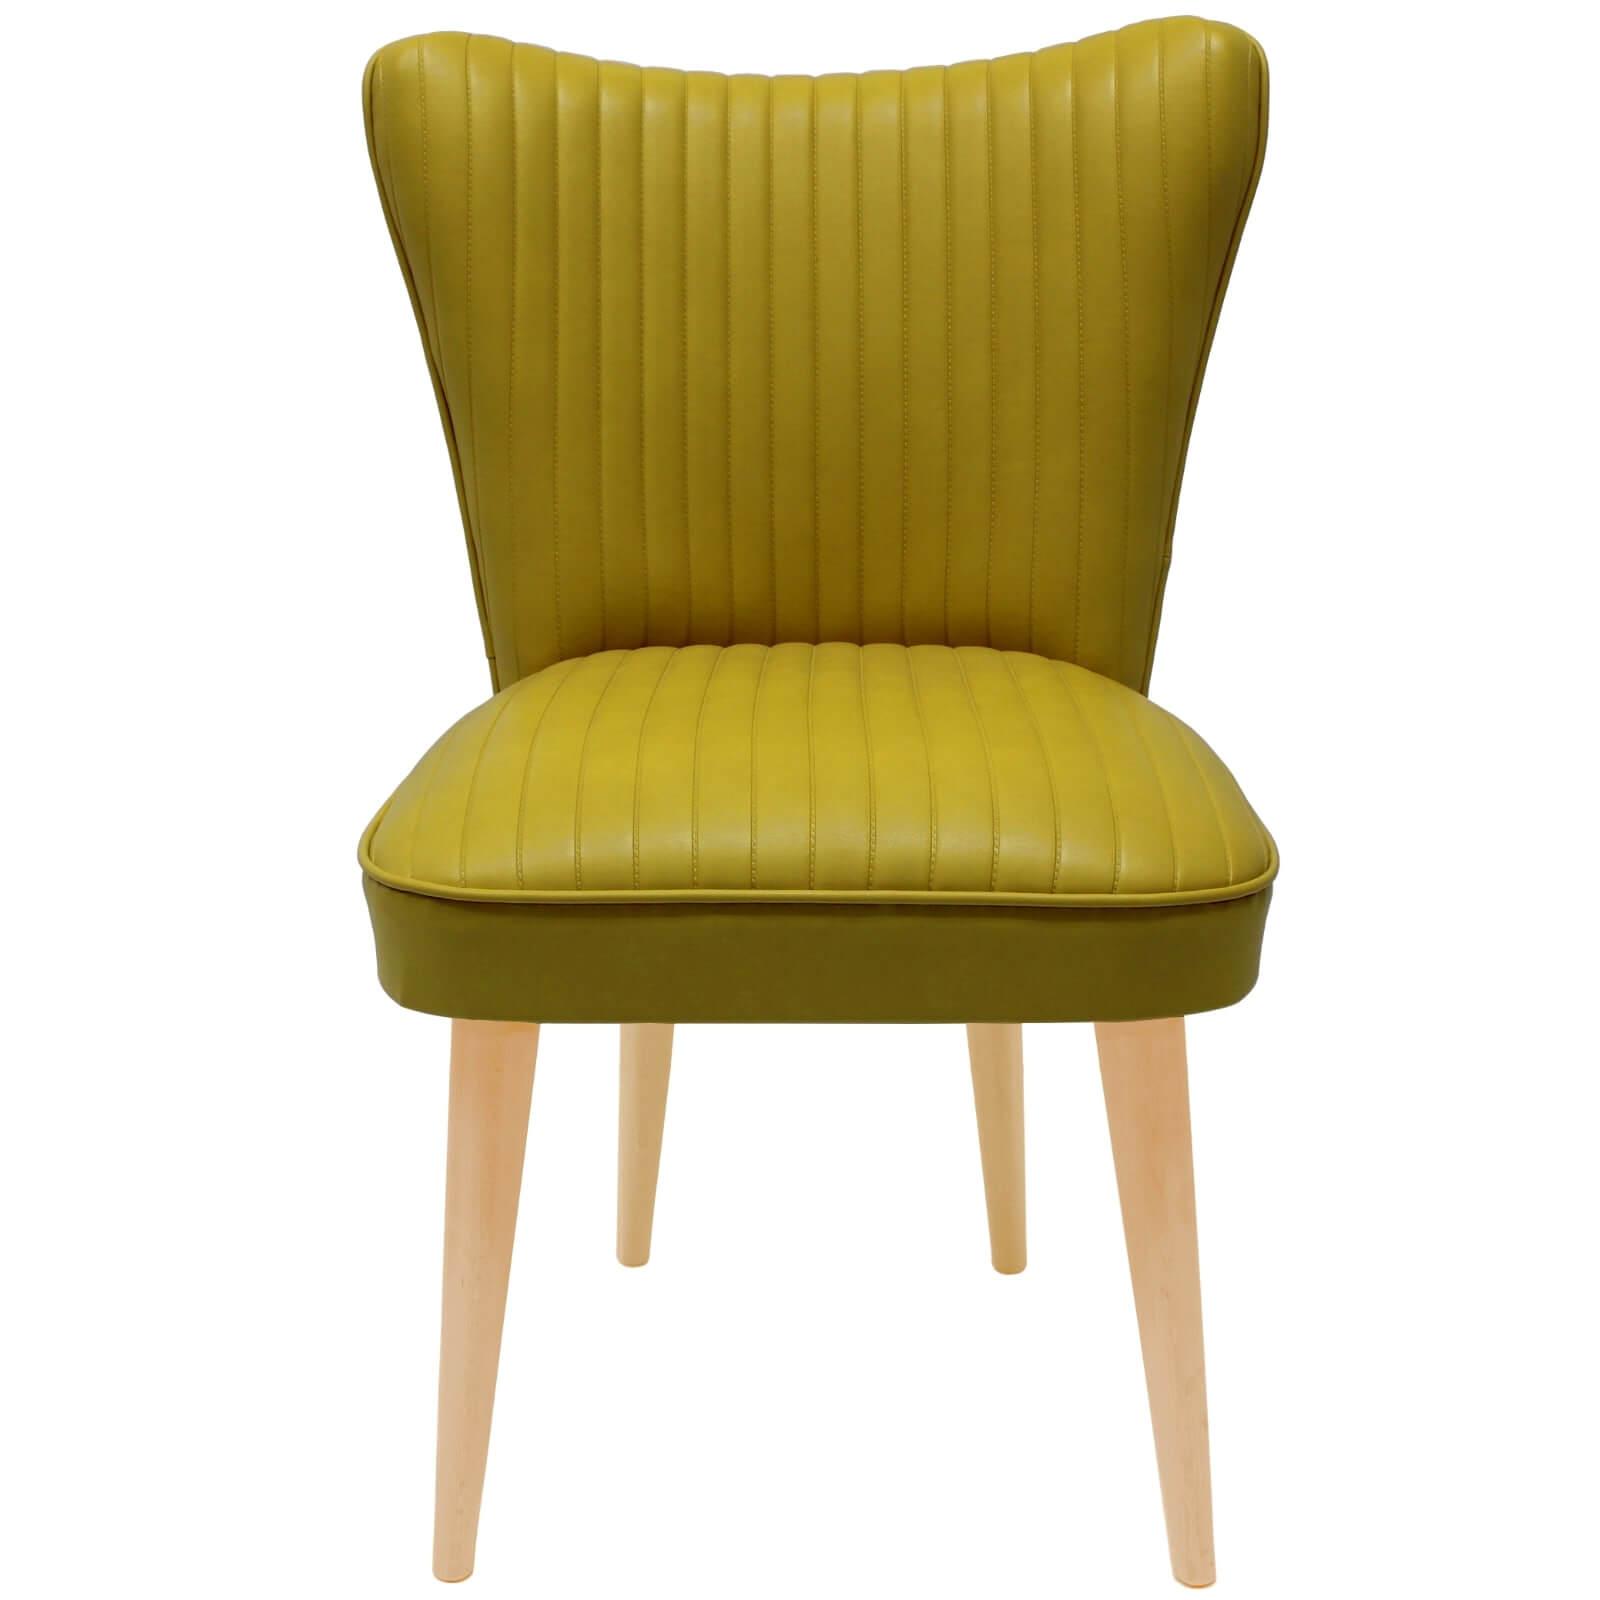 Poltroncina in Ecopelle giallo stile Vintage con gamba in legno ...